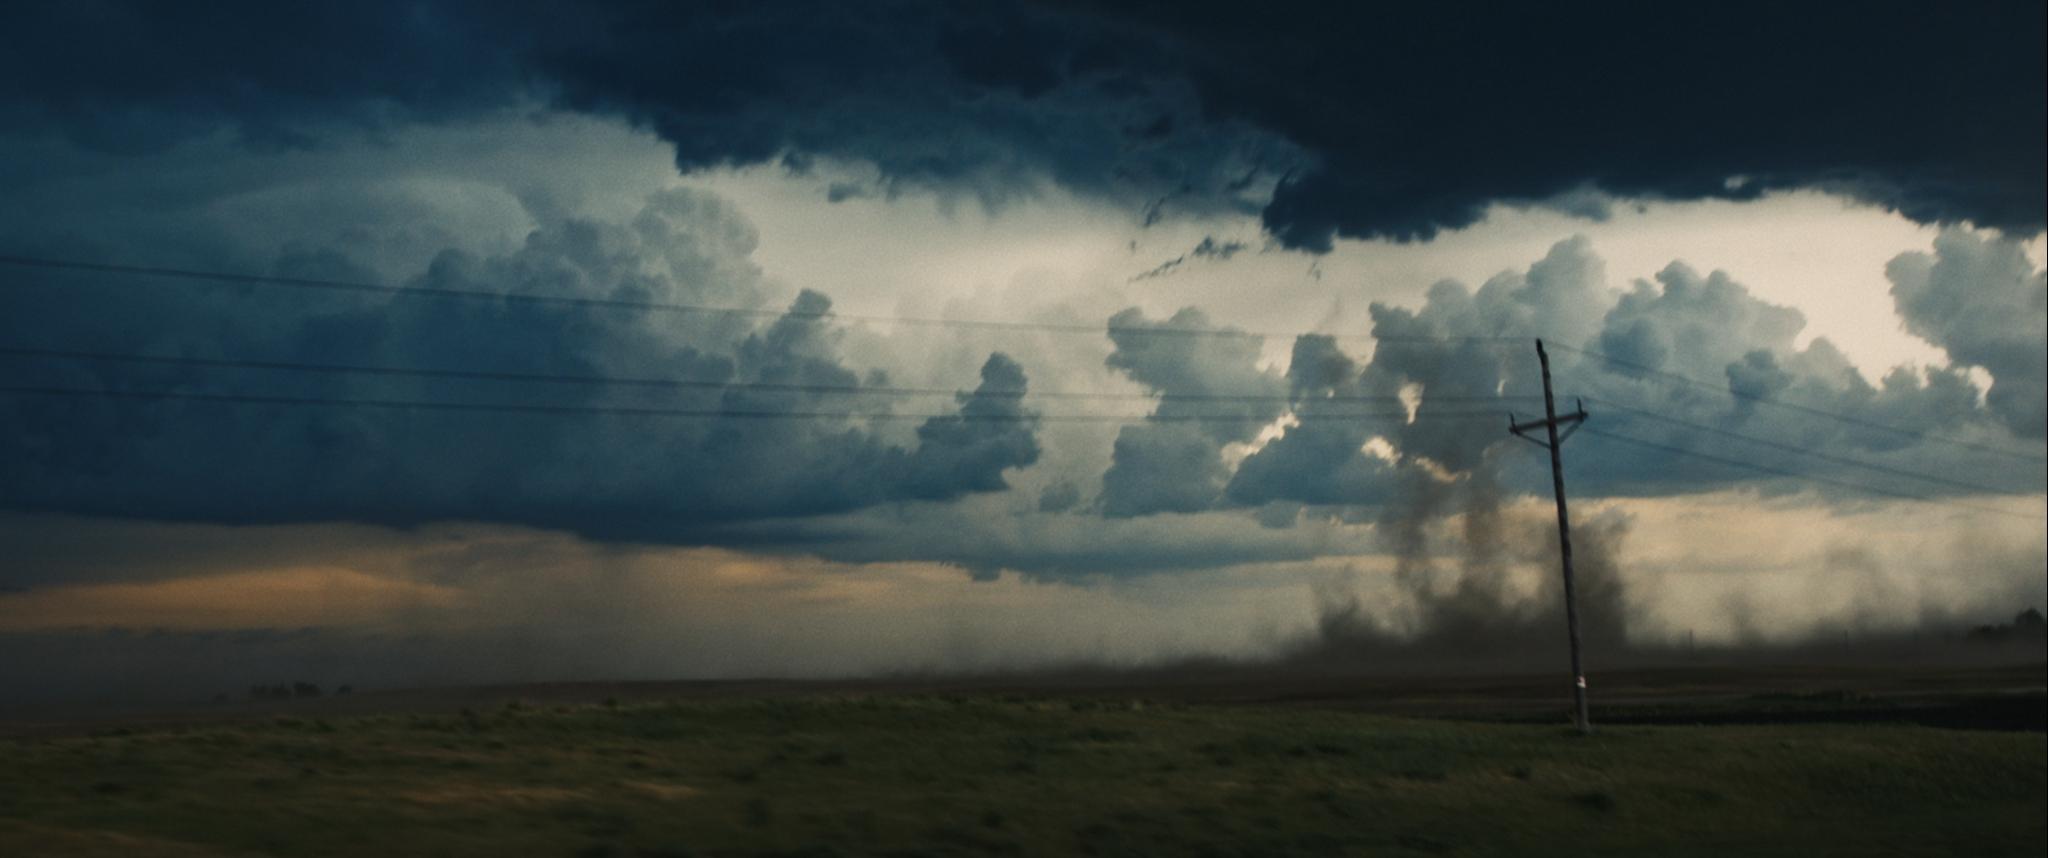 THe Last Storm_1.121.1.jpg